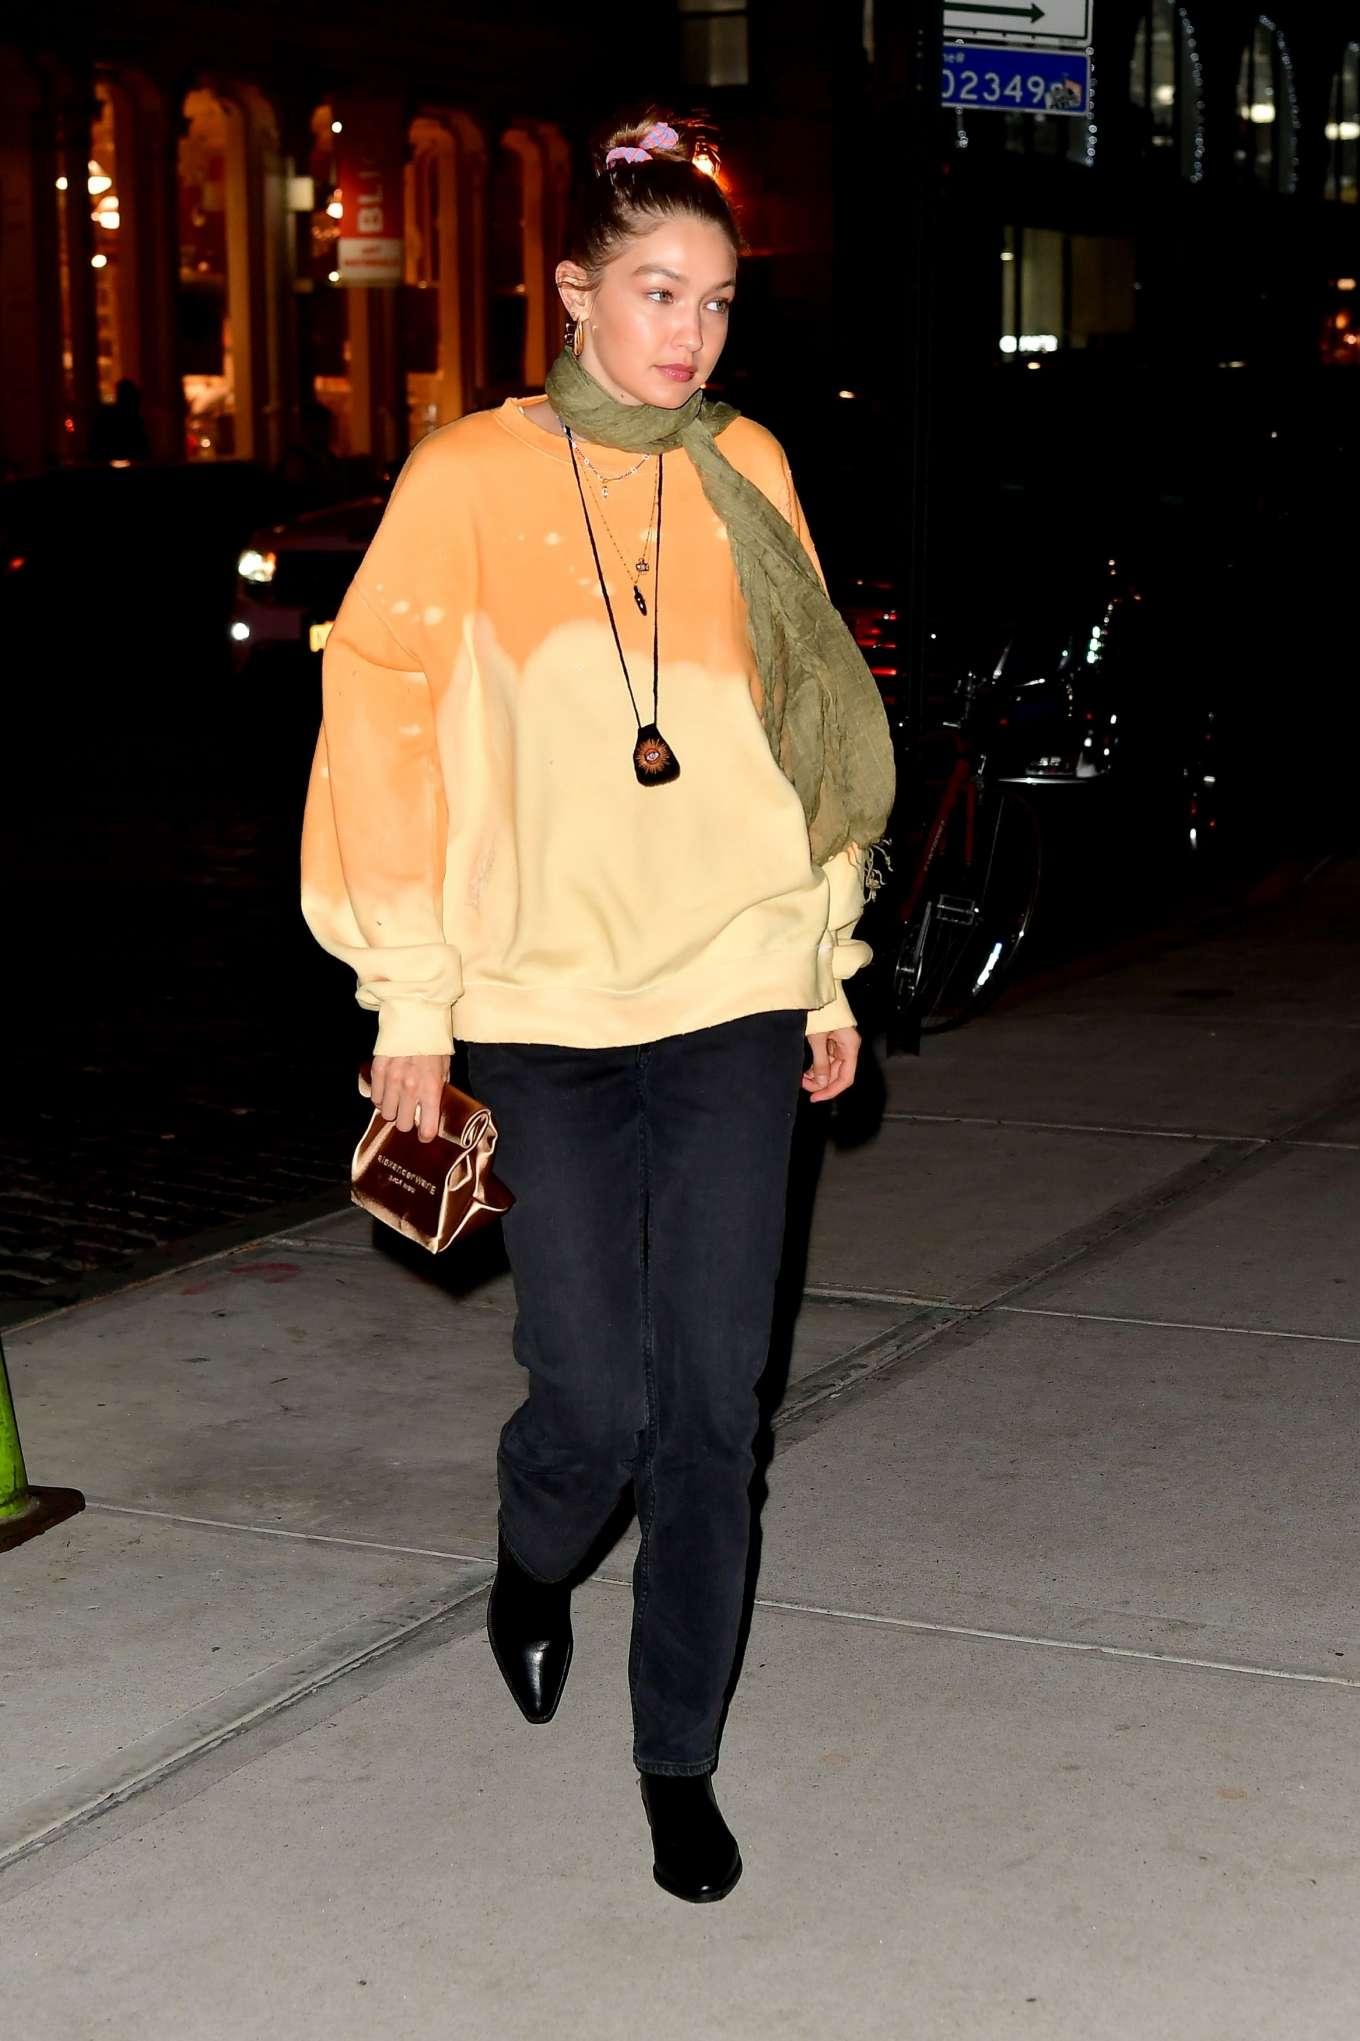 Gigi Hadid 2019 : Gigi Hadid – Leaving La Esquina Restaurant-16